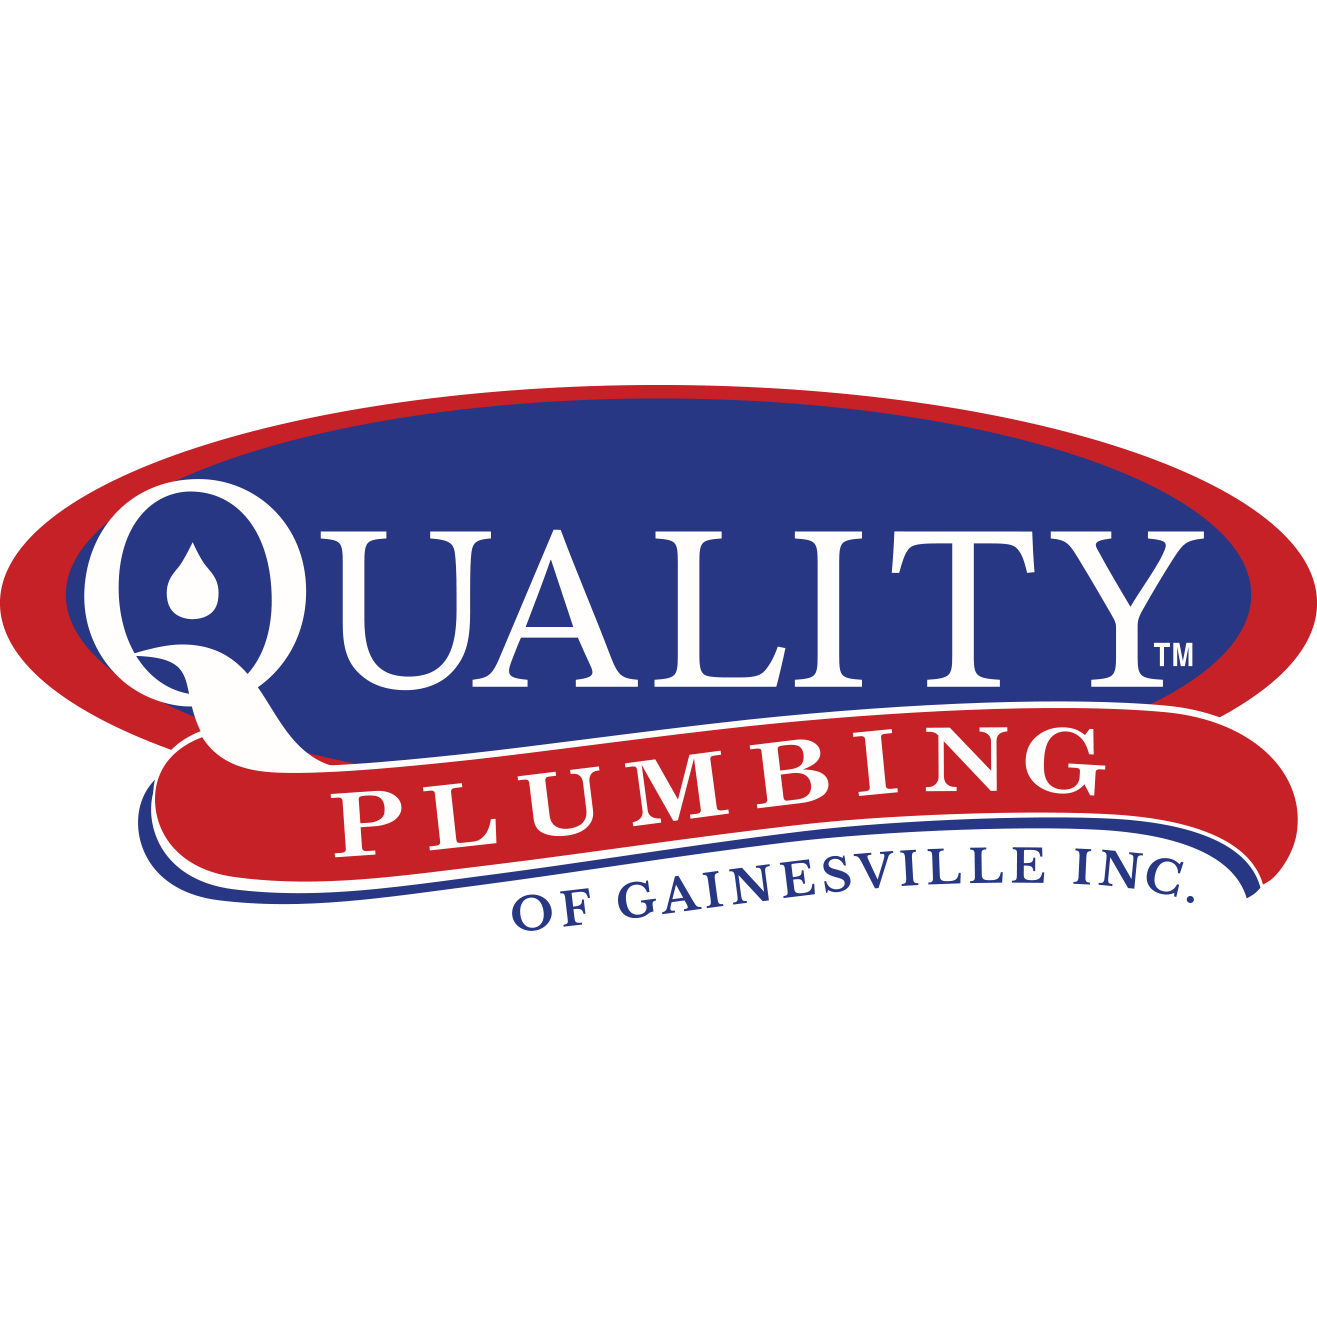 Quality Plumbing - Gainesville, FL - Plumbers & Sewer Repair